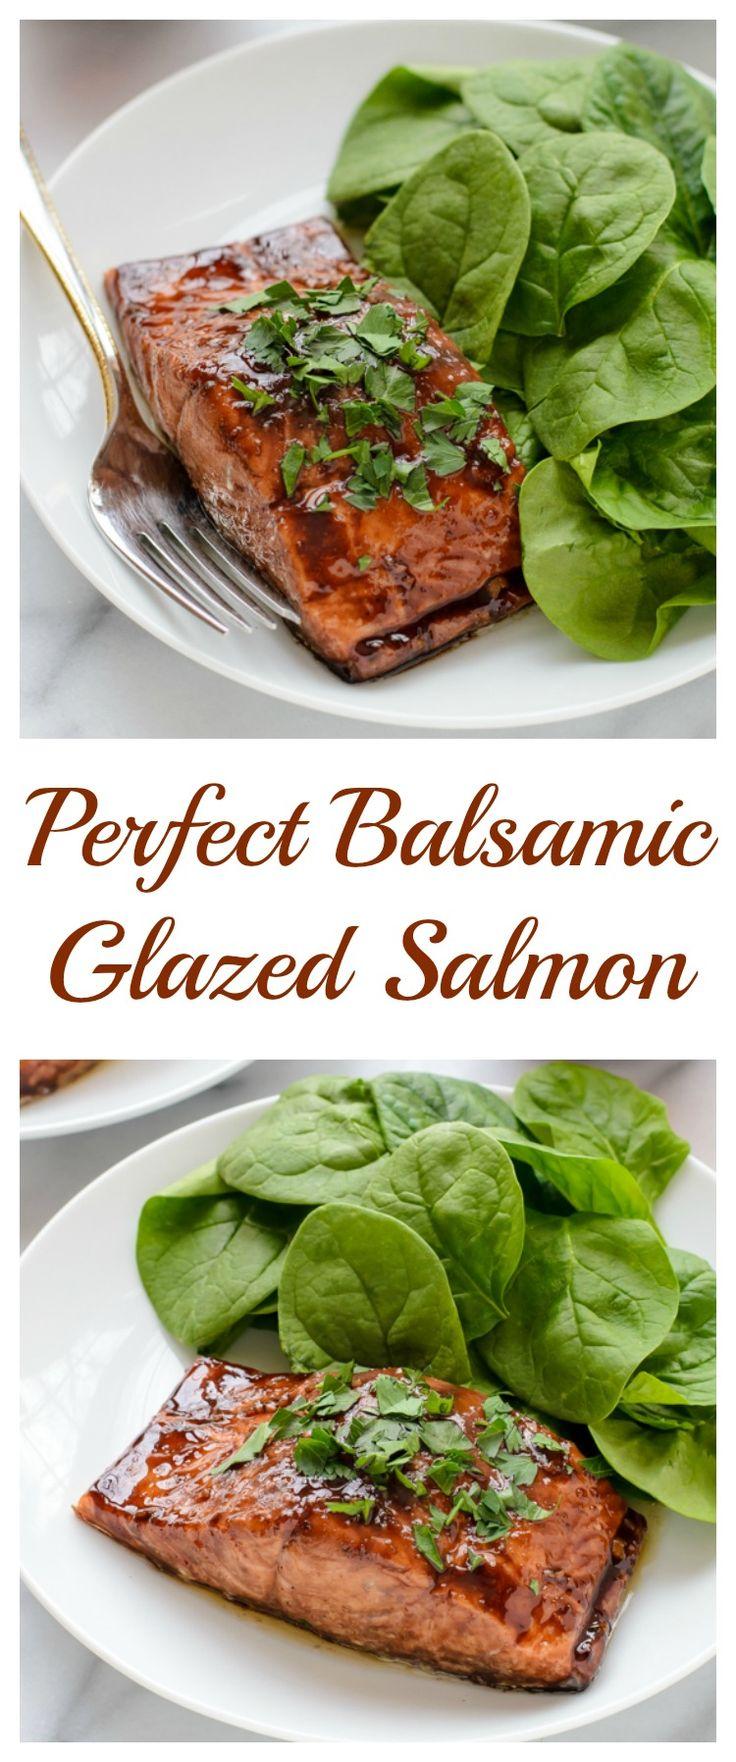 Balsamic And Raisin Glazed Salmon Recipe — Dishmaps